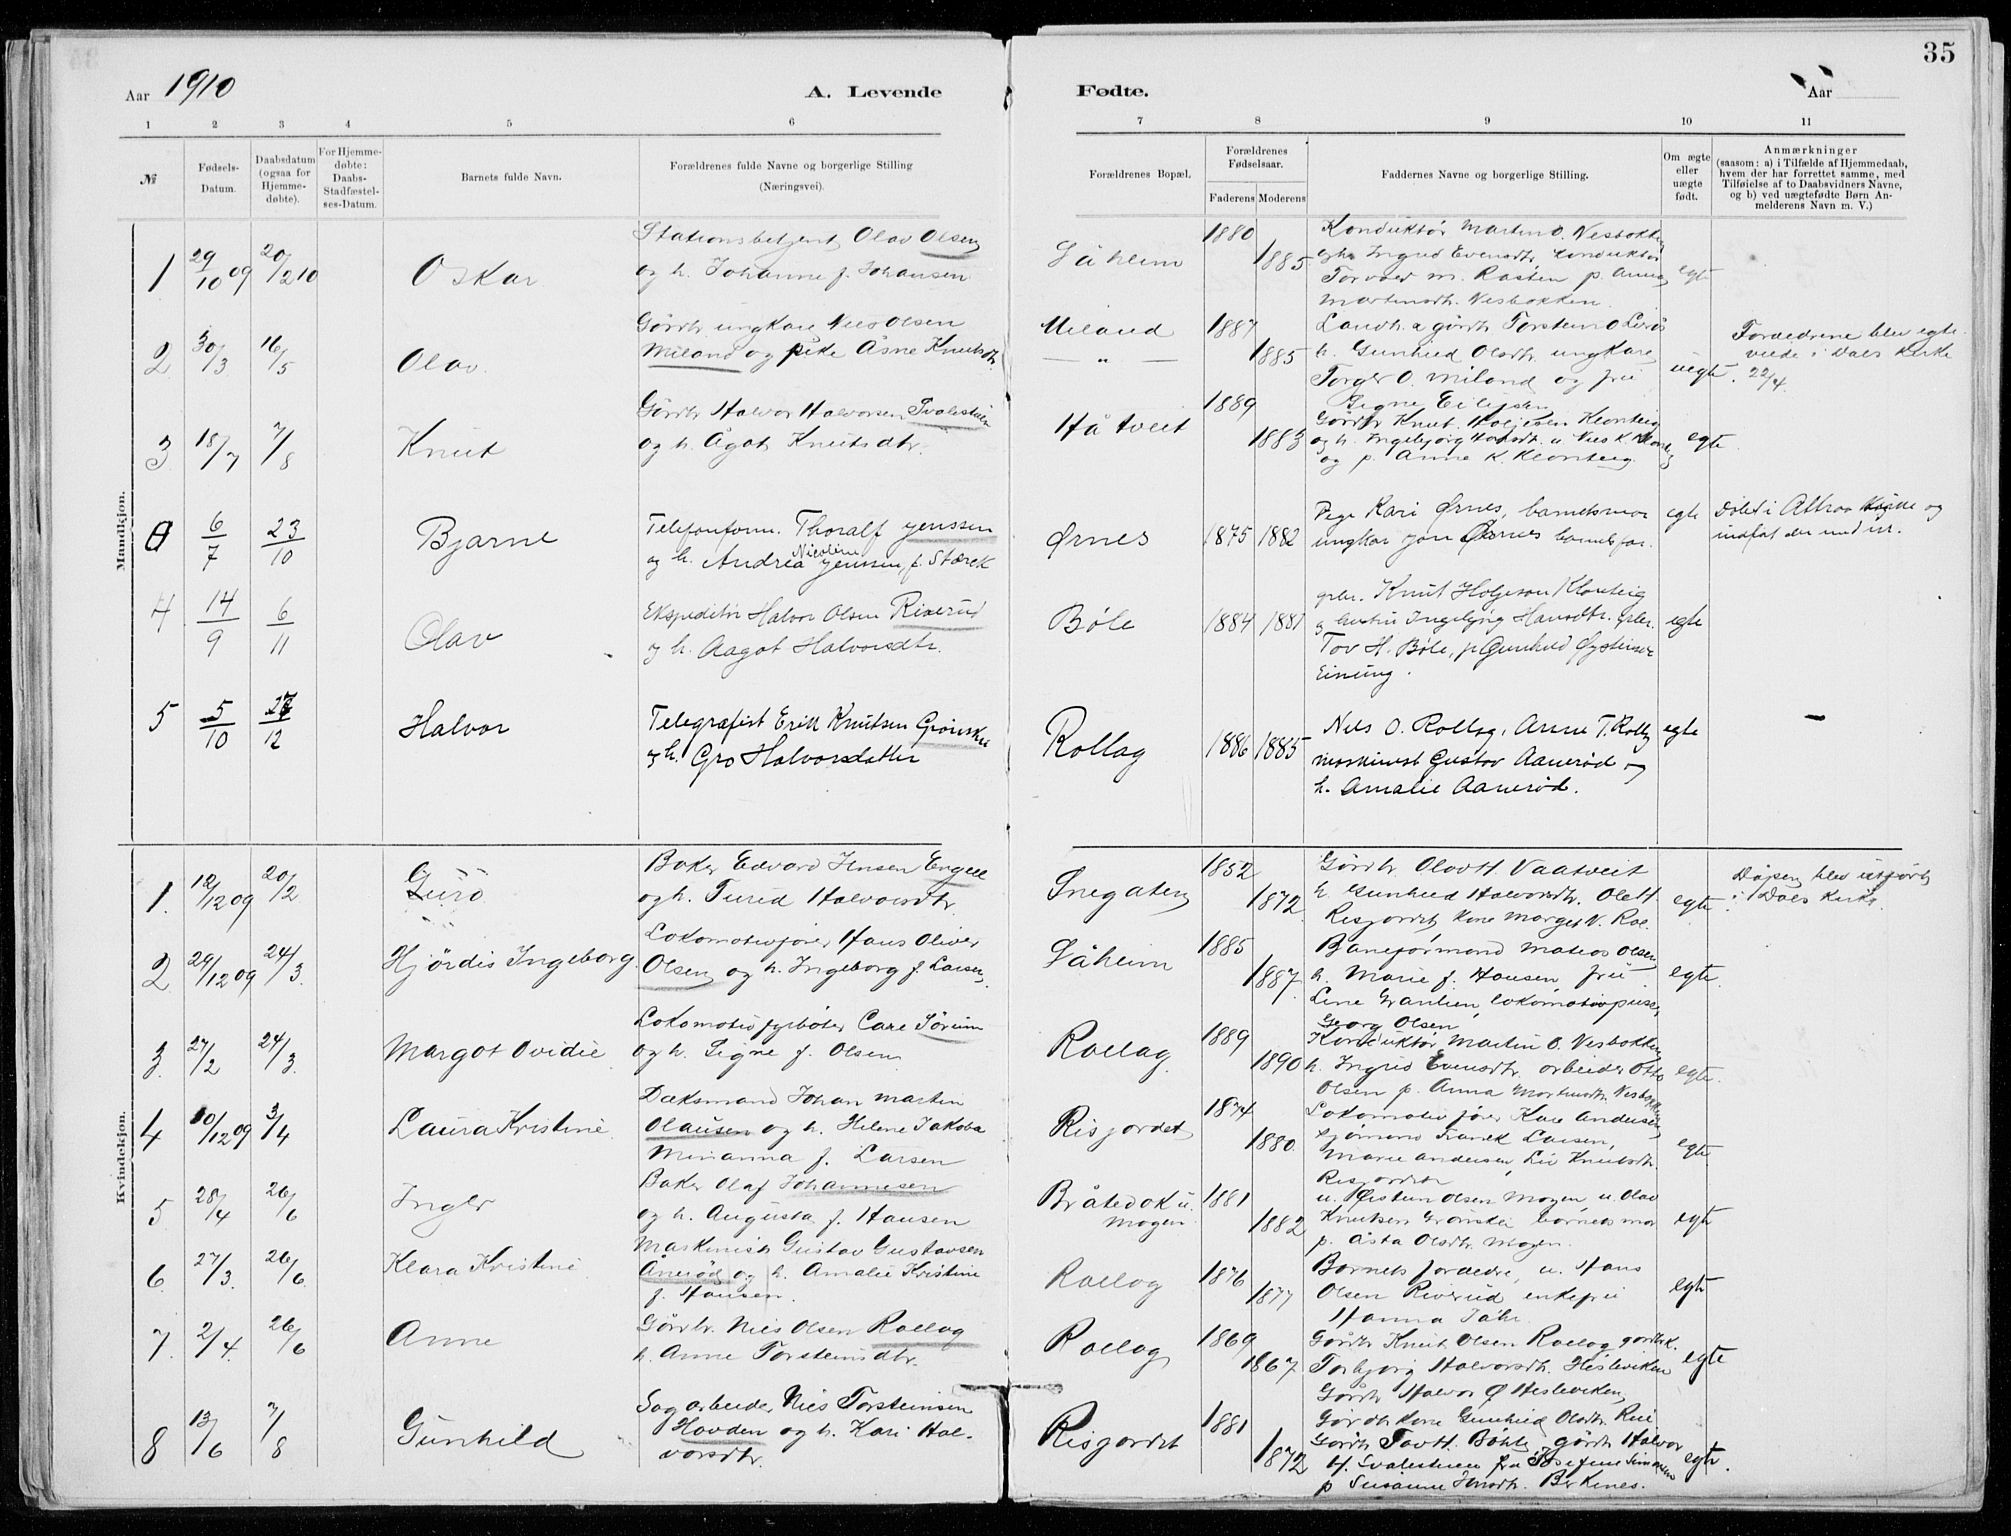 SAKO, Tinn kirkebøker, F/Fb/L0002: Ministerialbok nr. II 2, 1878-1917, s. 35